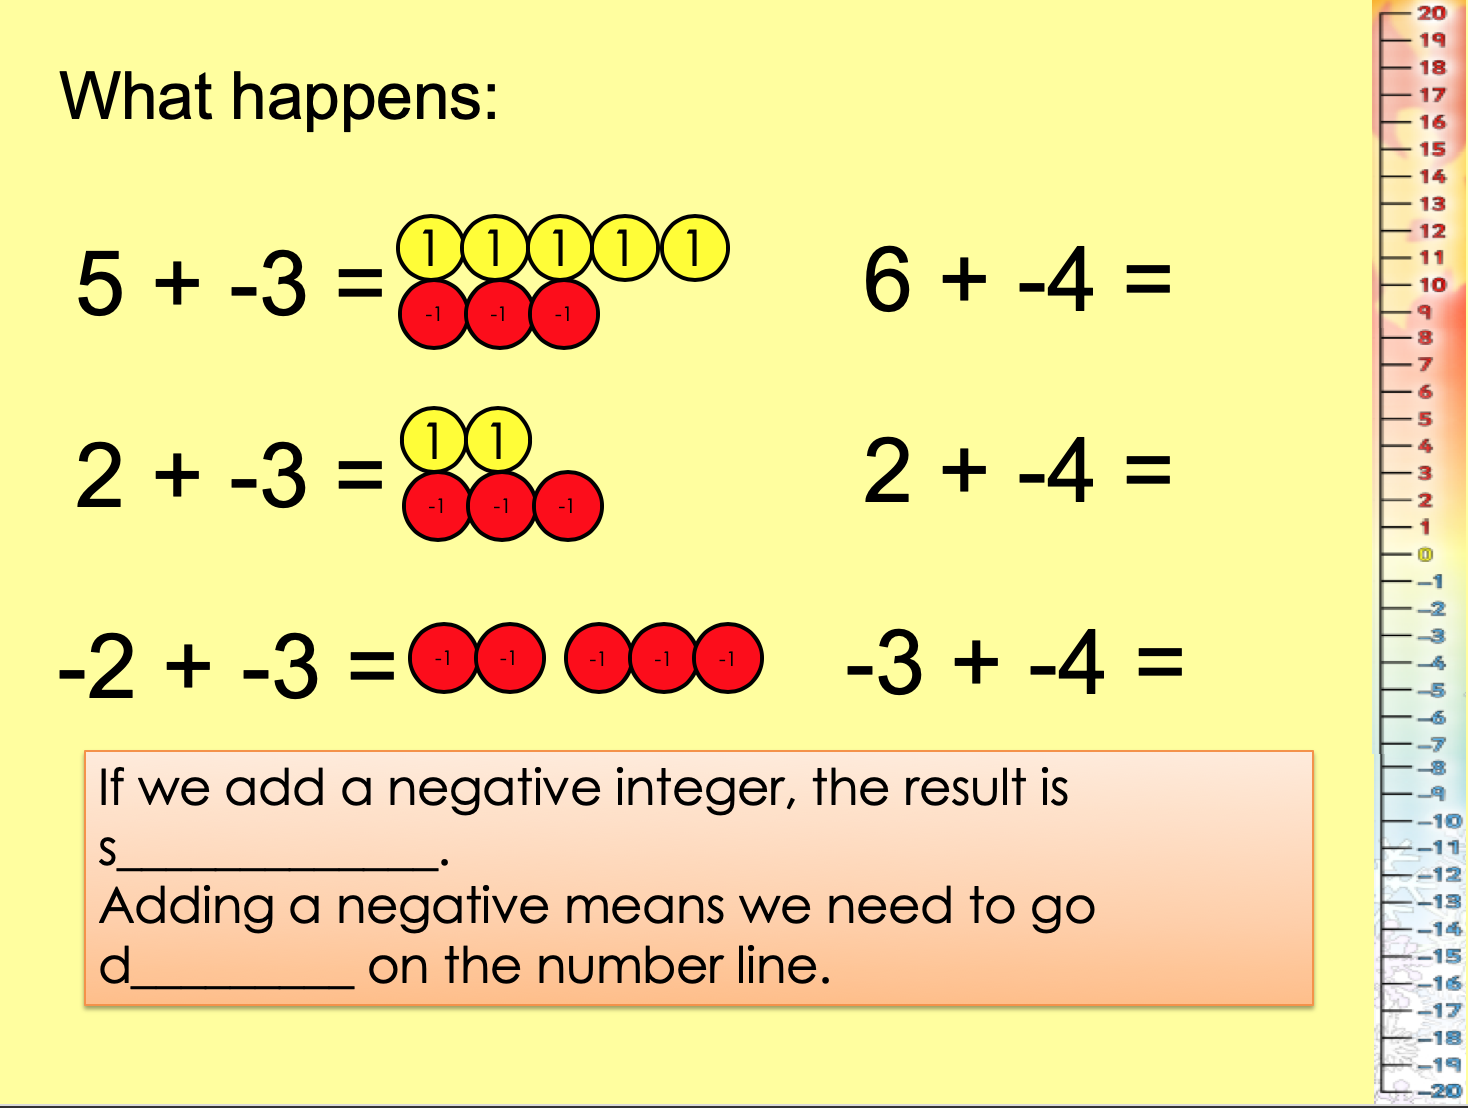 Adding a negative